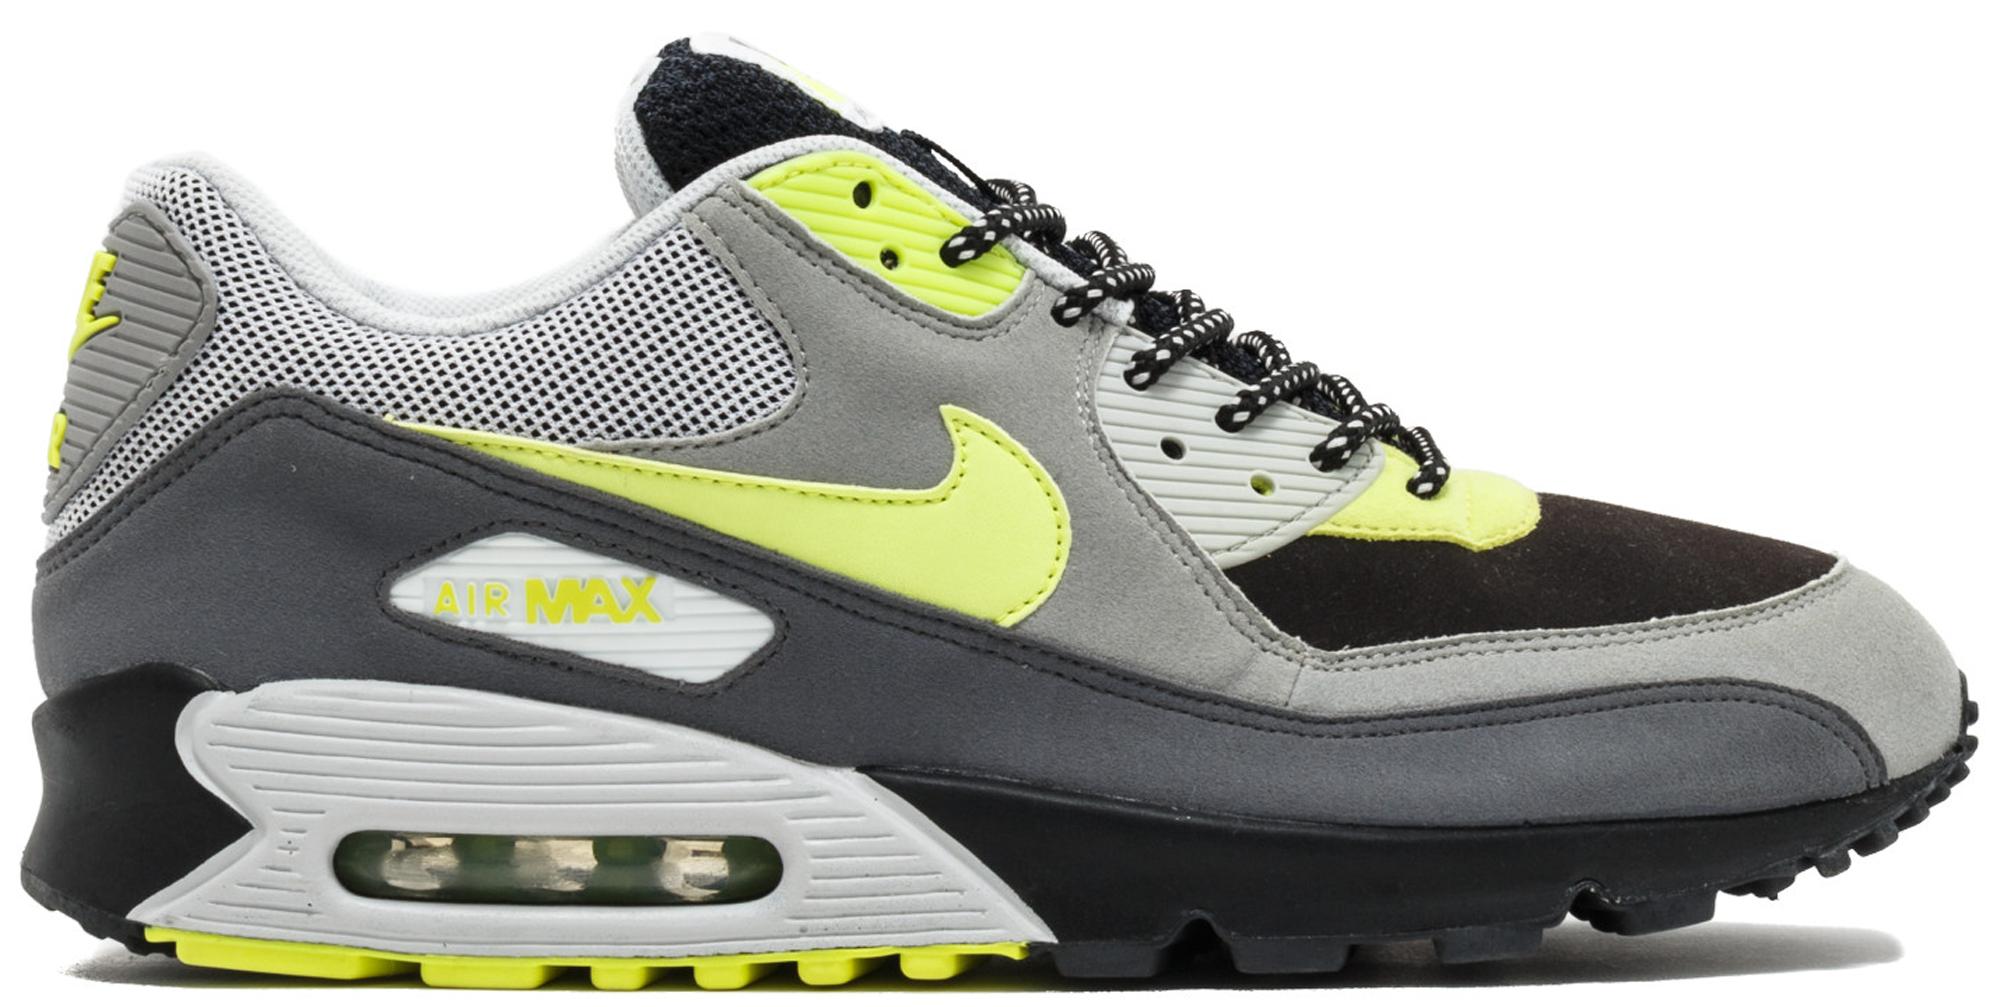 Nike Air Max 90 Dave White Neon Pack